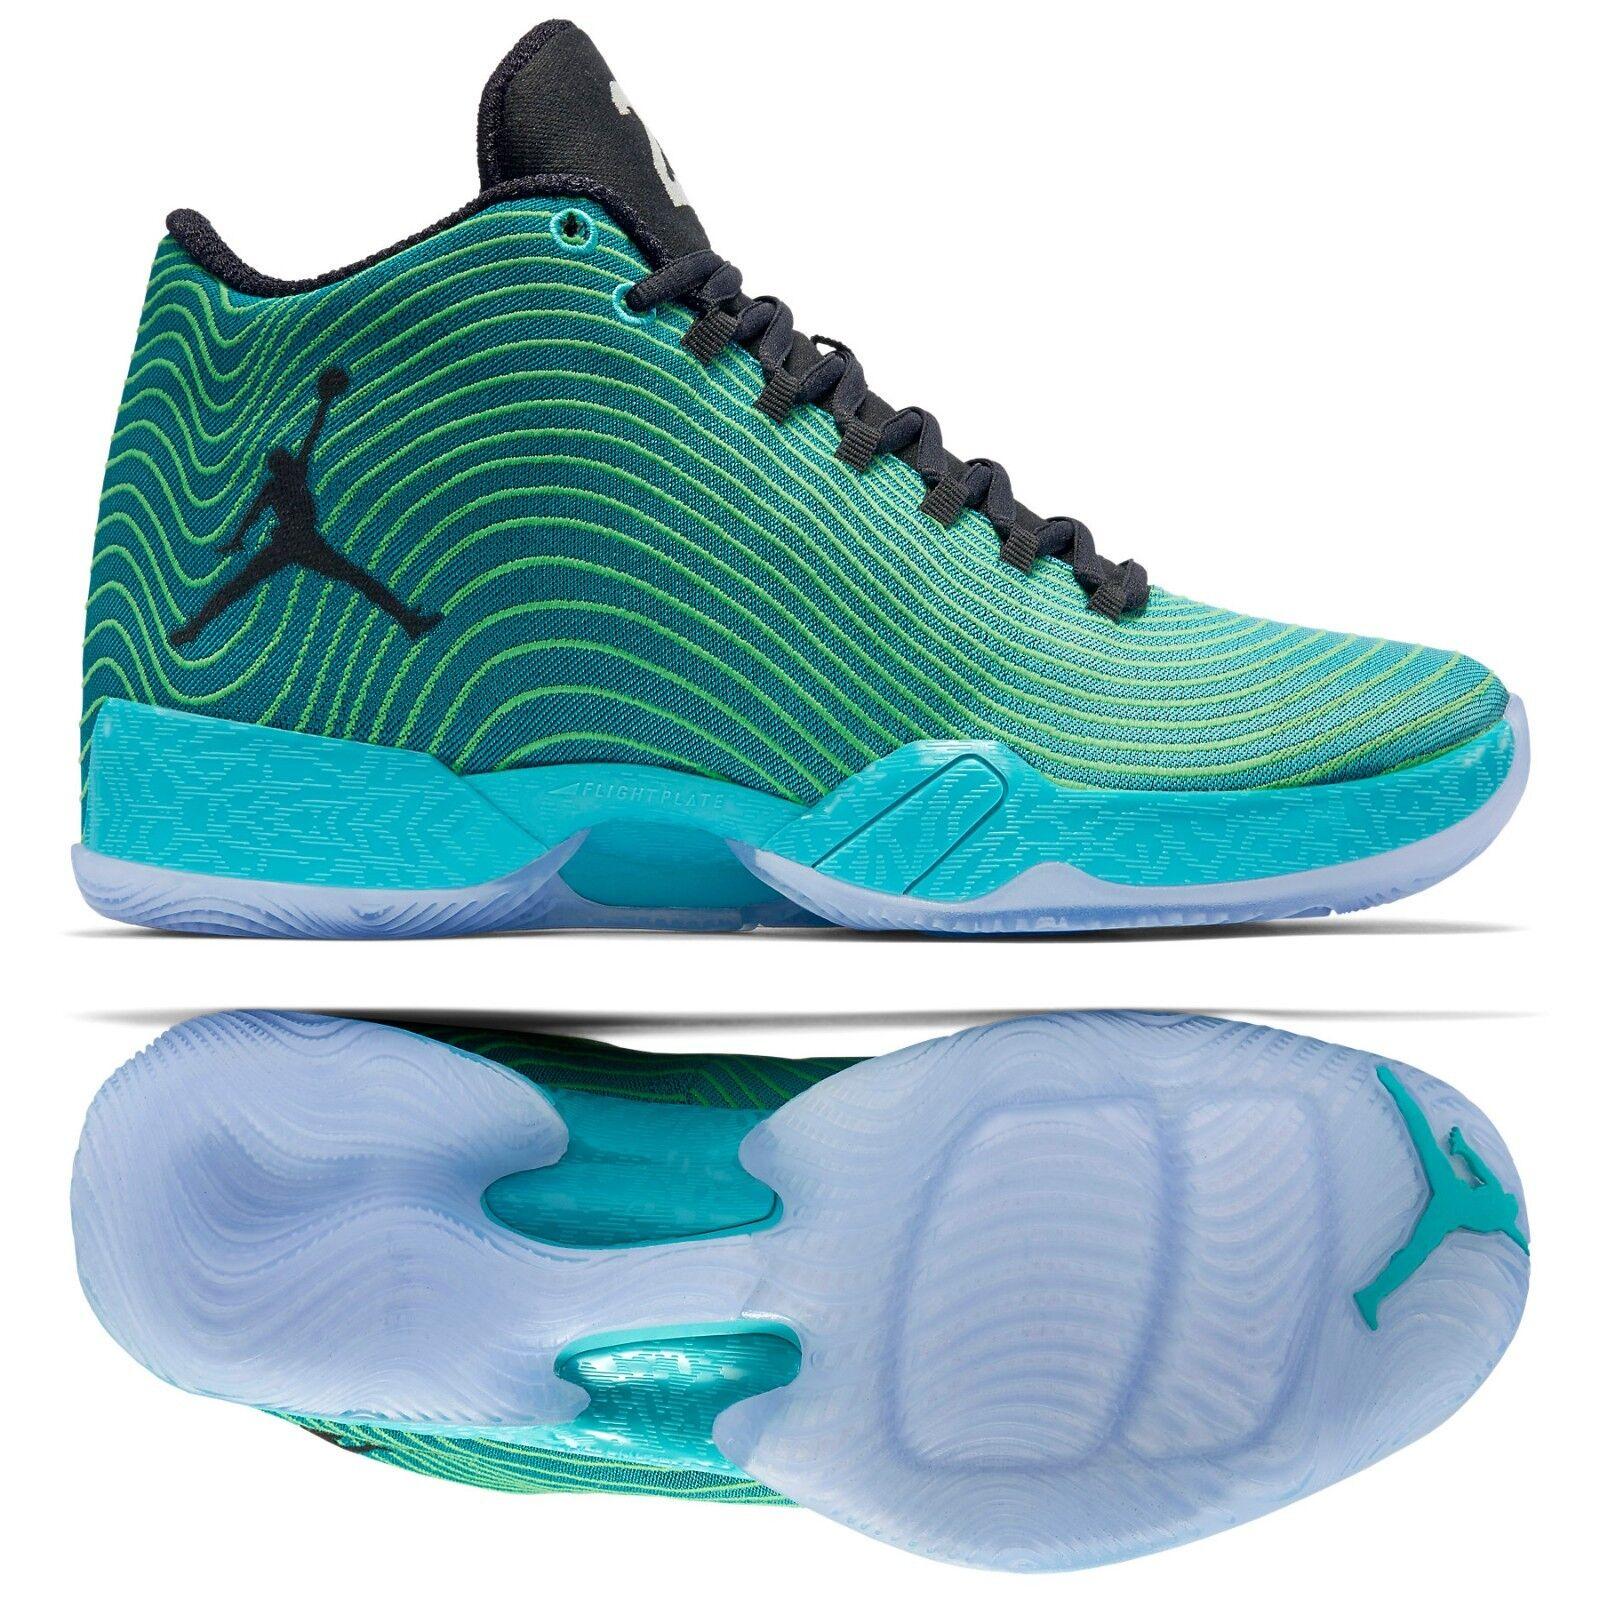 Nike Air Retro/Black/Emerald/Green Jordan XX9 Easter 695515-403 Retro/Black/Emerald/Green Air Spark Men Shoes e44b83